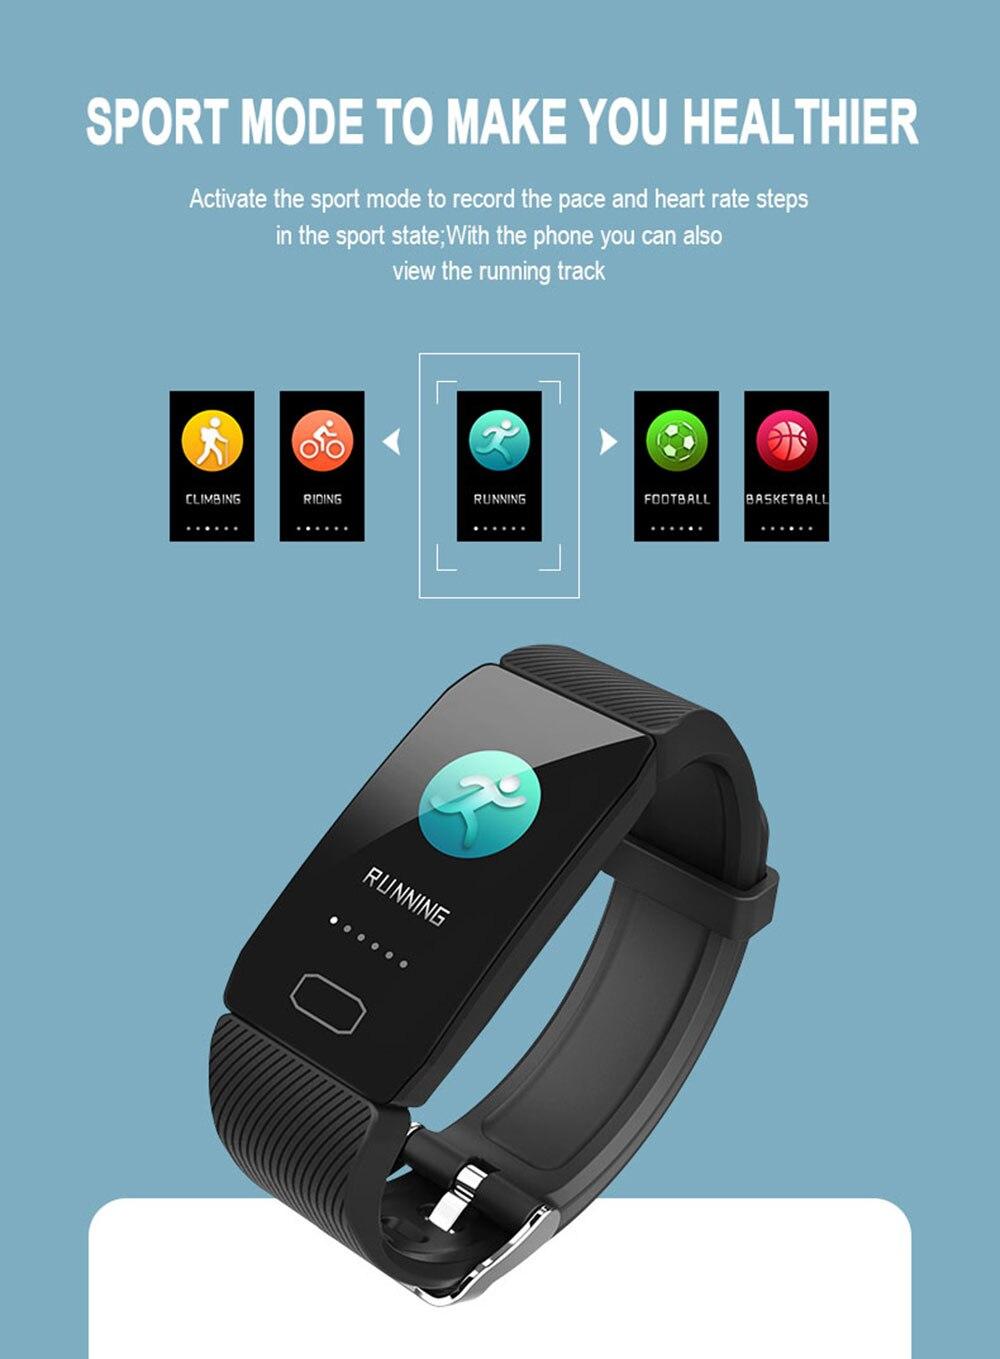 HTB1P3C9XKH2gK0jSZFEq6AqMpXaP Smart Band Blood Pressure Q1 Heart Rate Monitor Fitness Tracker Smart Watch Fitness Bracelet Waterproof Weather Display Women